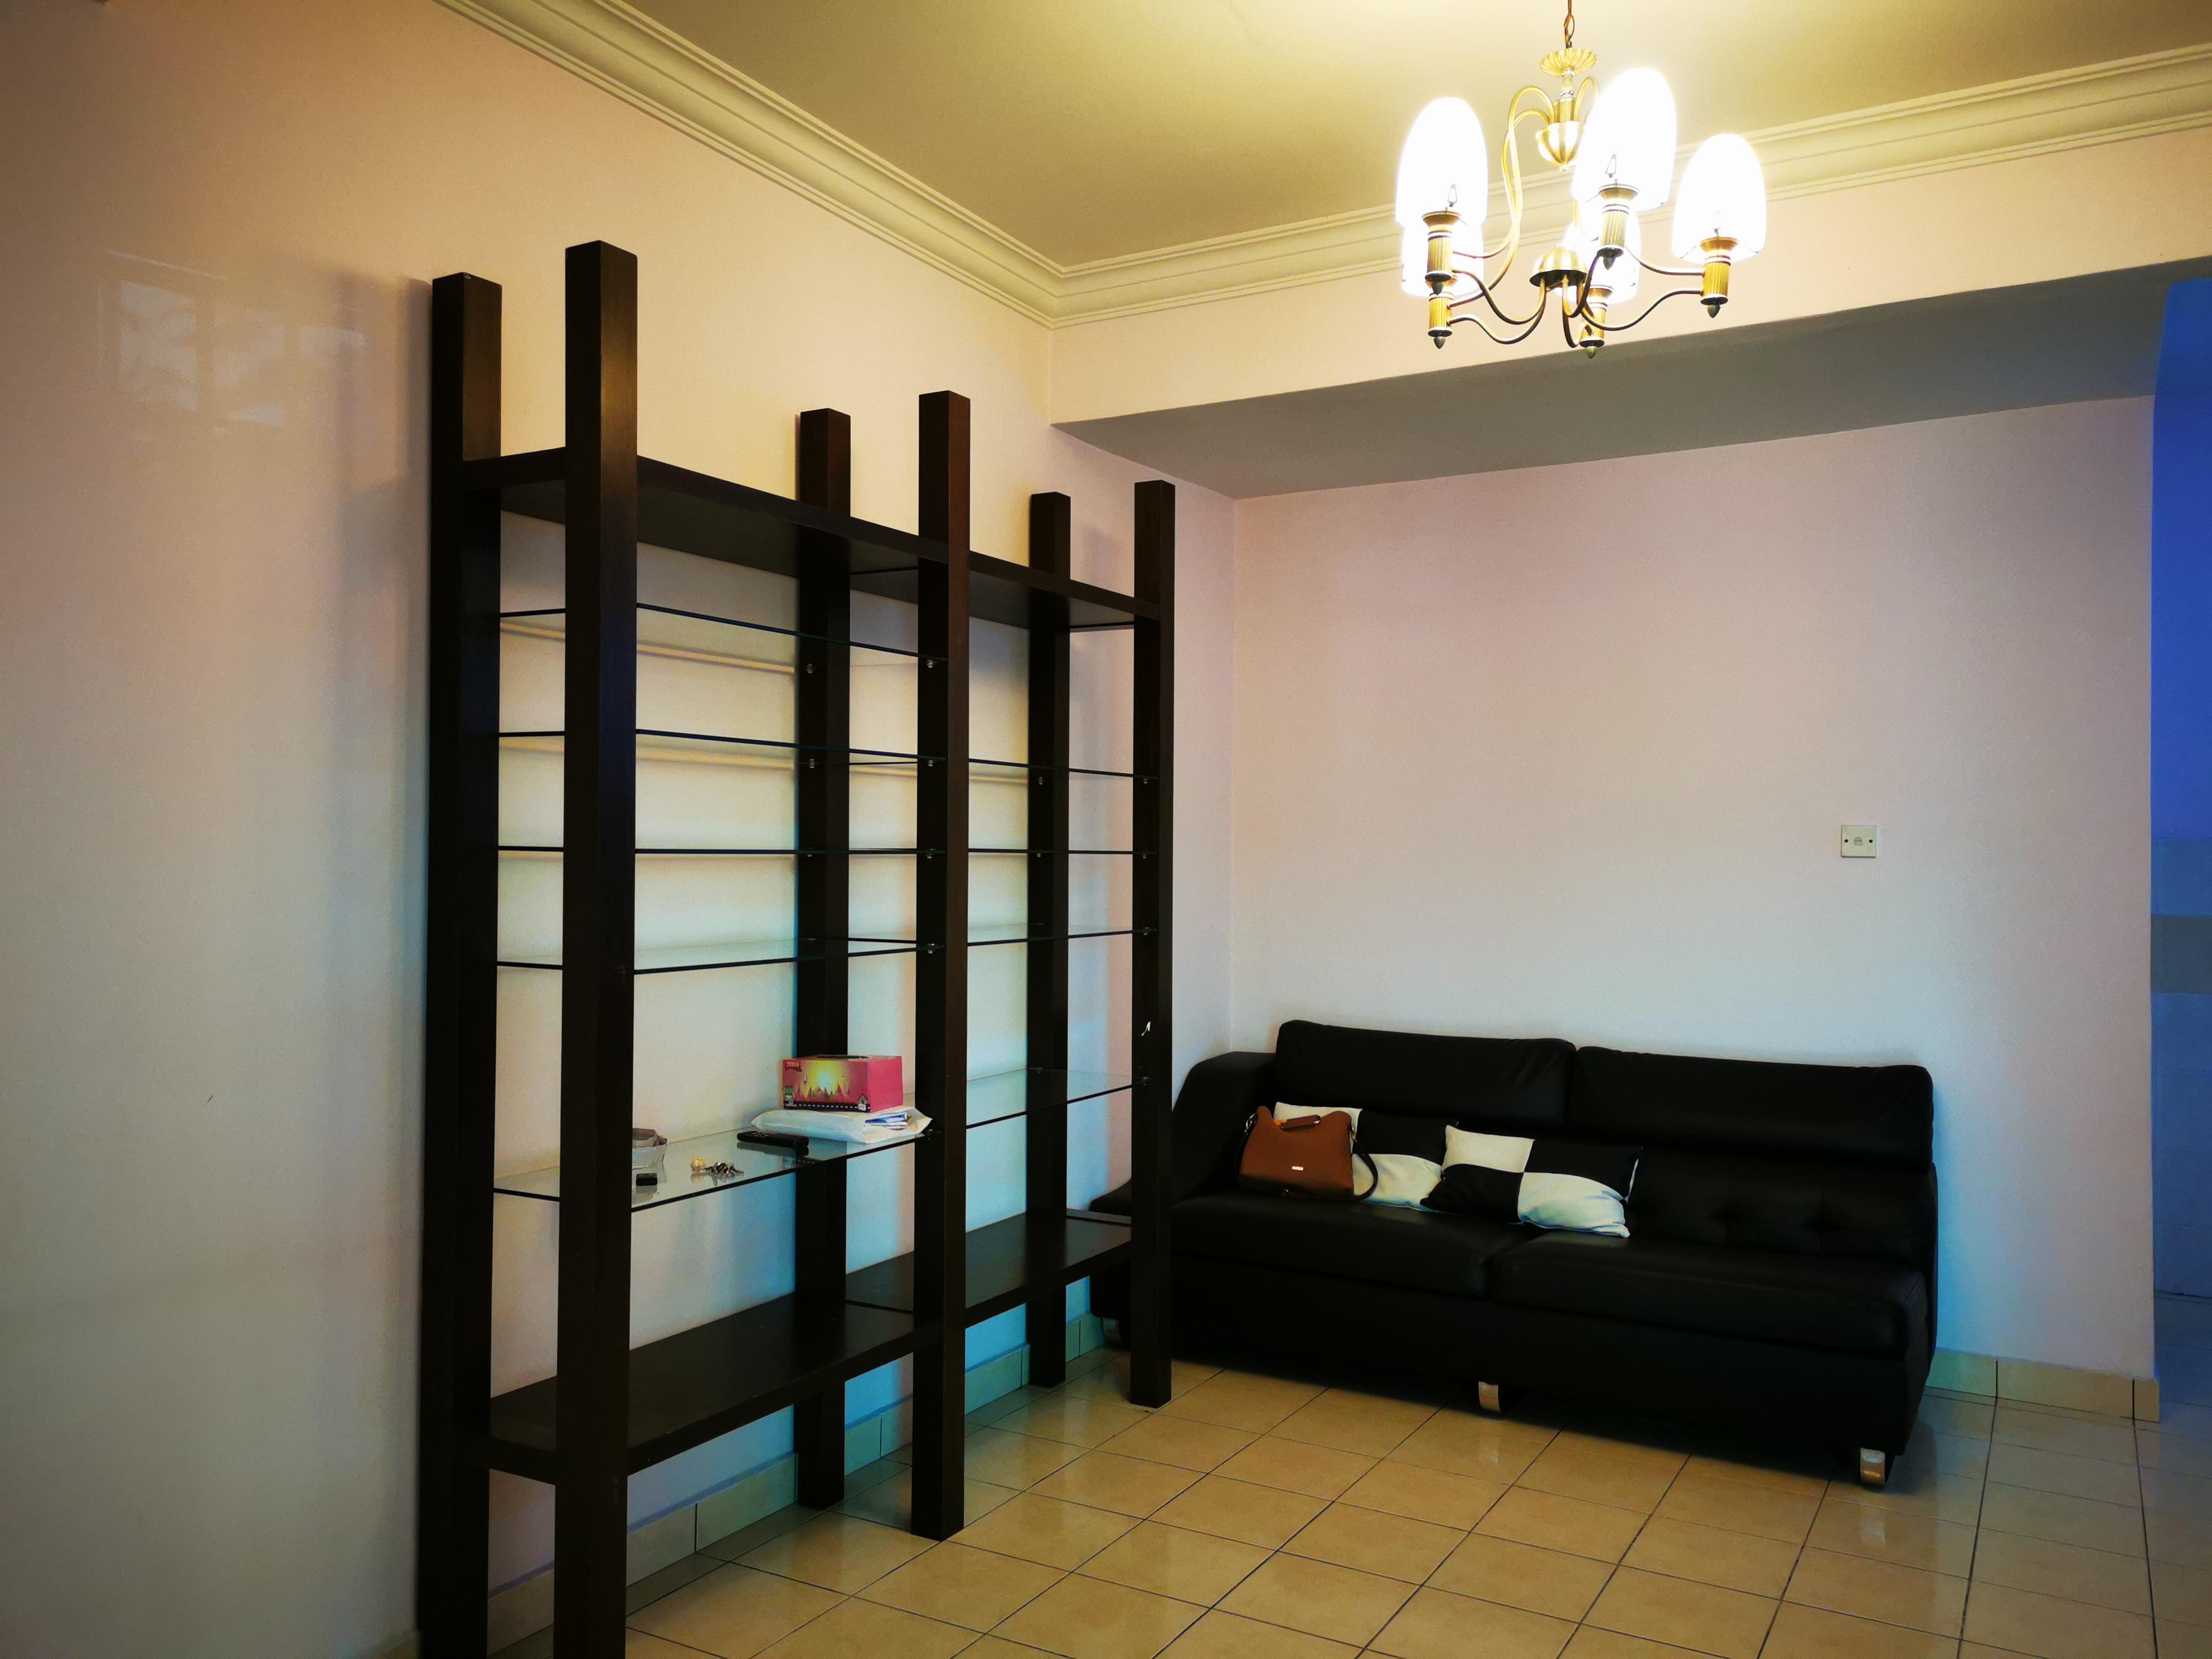 Taman Putra Prima Puchong Medium Room For  Rent